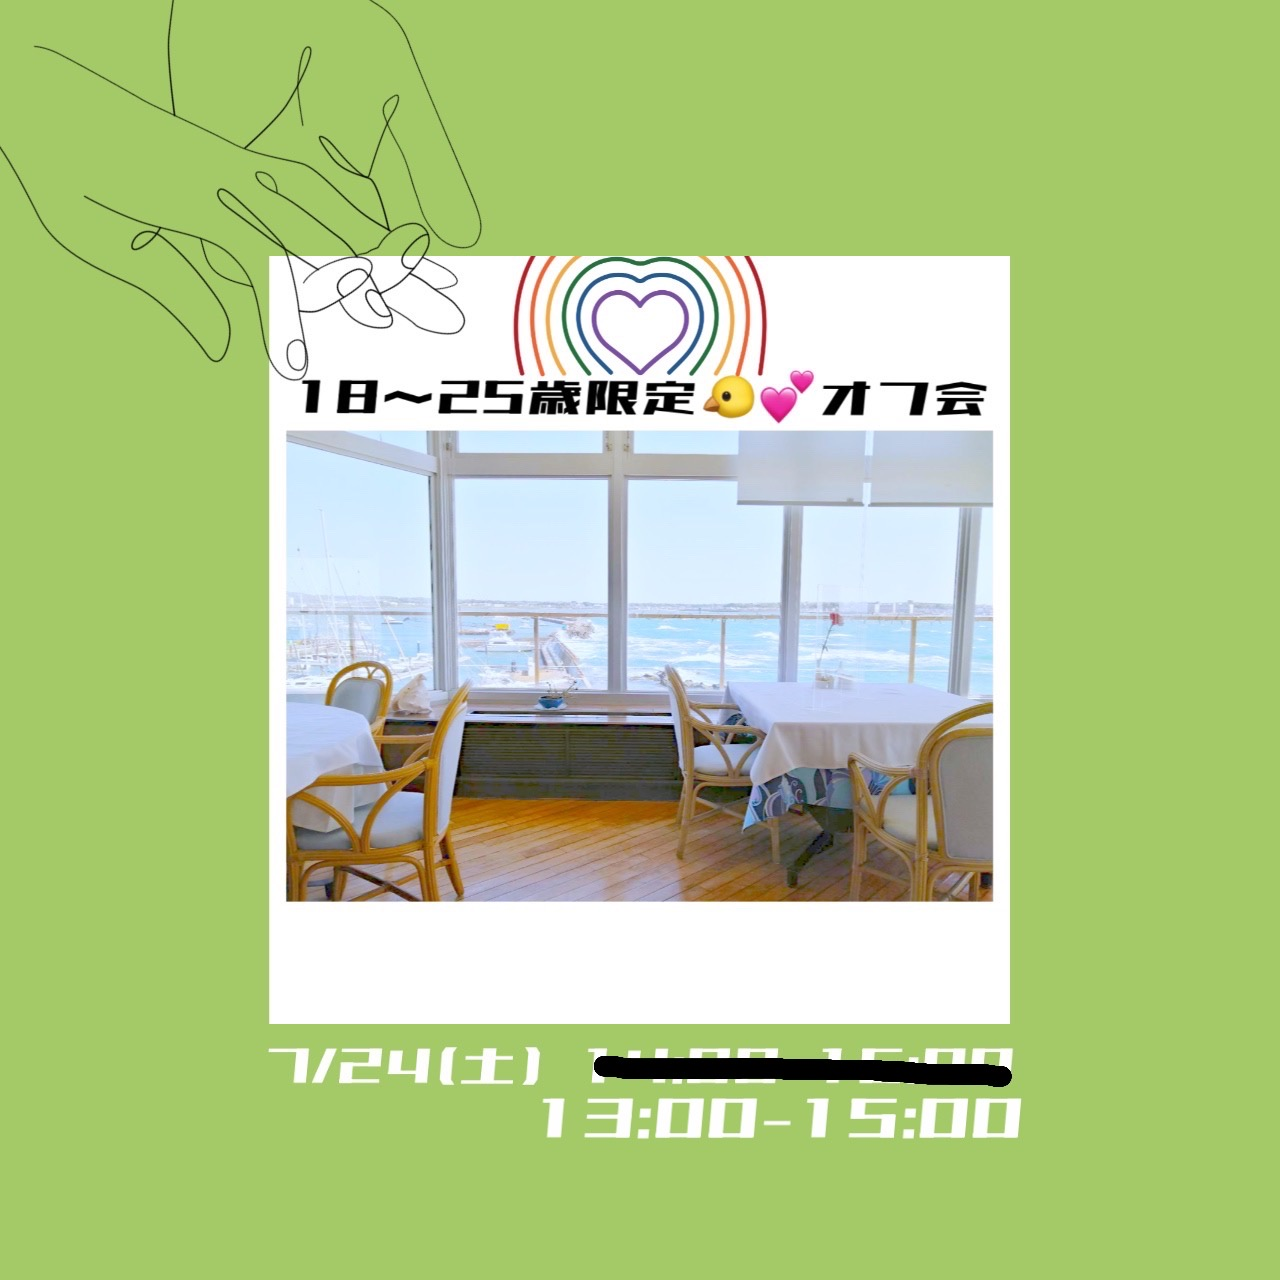 【湘南🏝江ノ島近辺】18〜25歳限定🐥💕オフ会